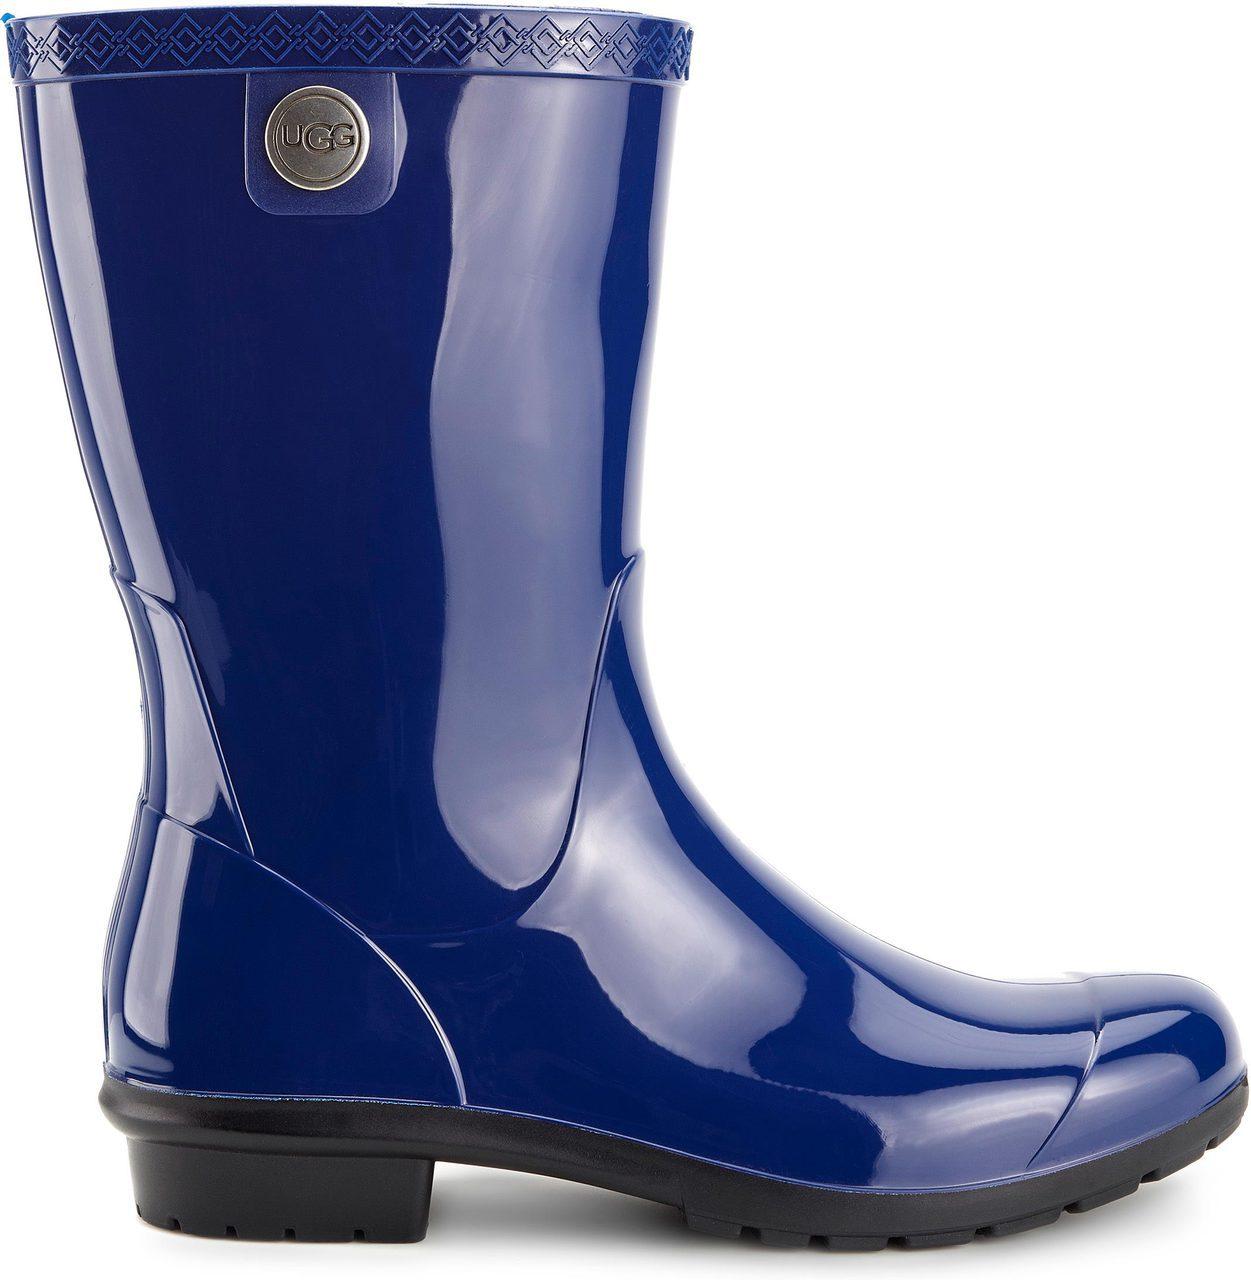 c65a627537e UGG Rain Boots for Fall - Englin's Fine Footwear